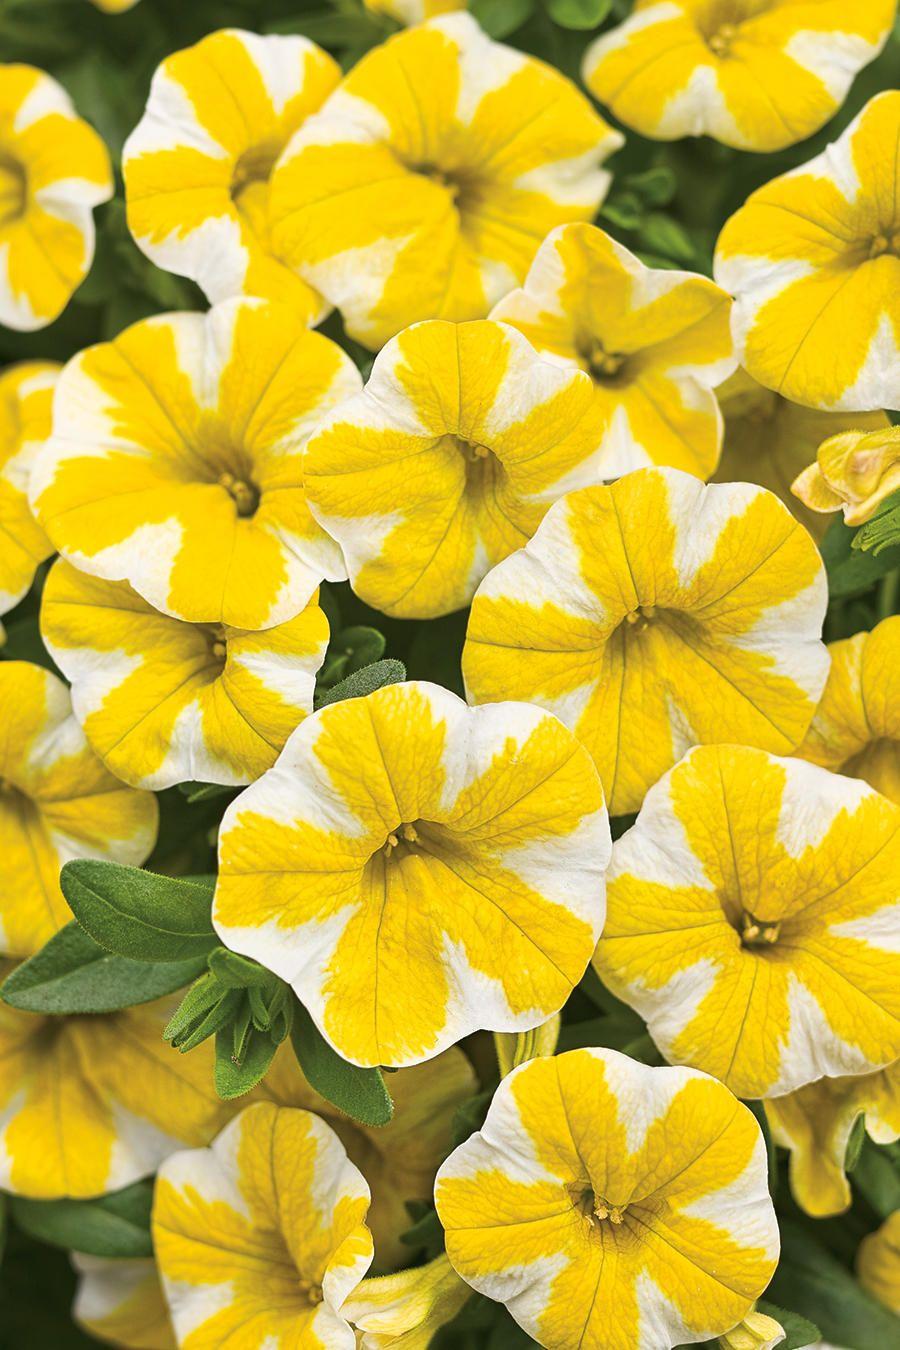 Superbells lemon slice calibrachoa hybrid lemon slice growing flowers izmirmasajfo Image collections